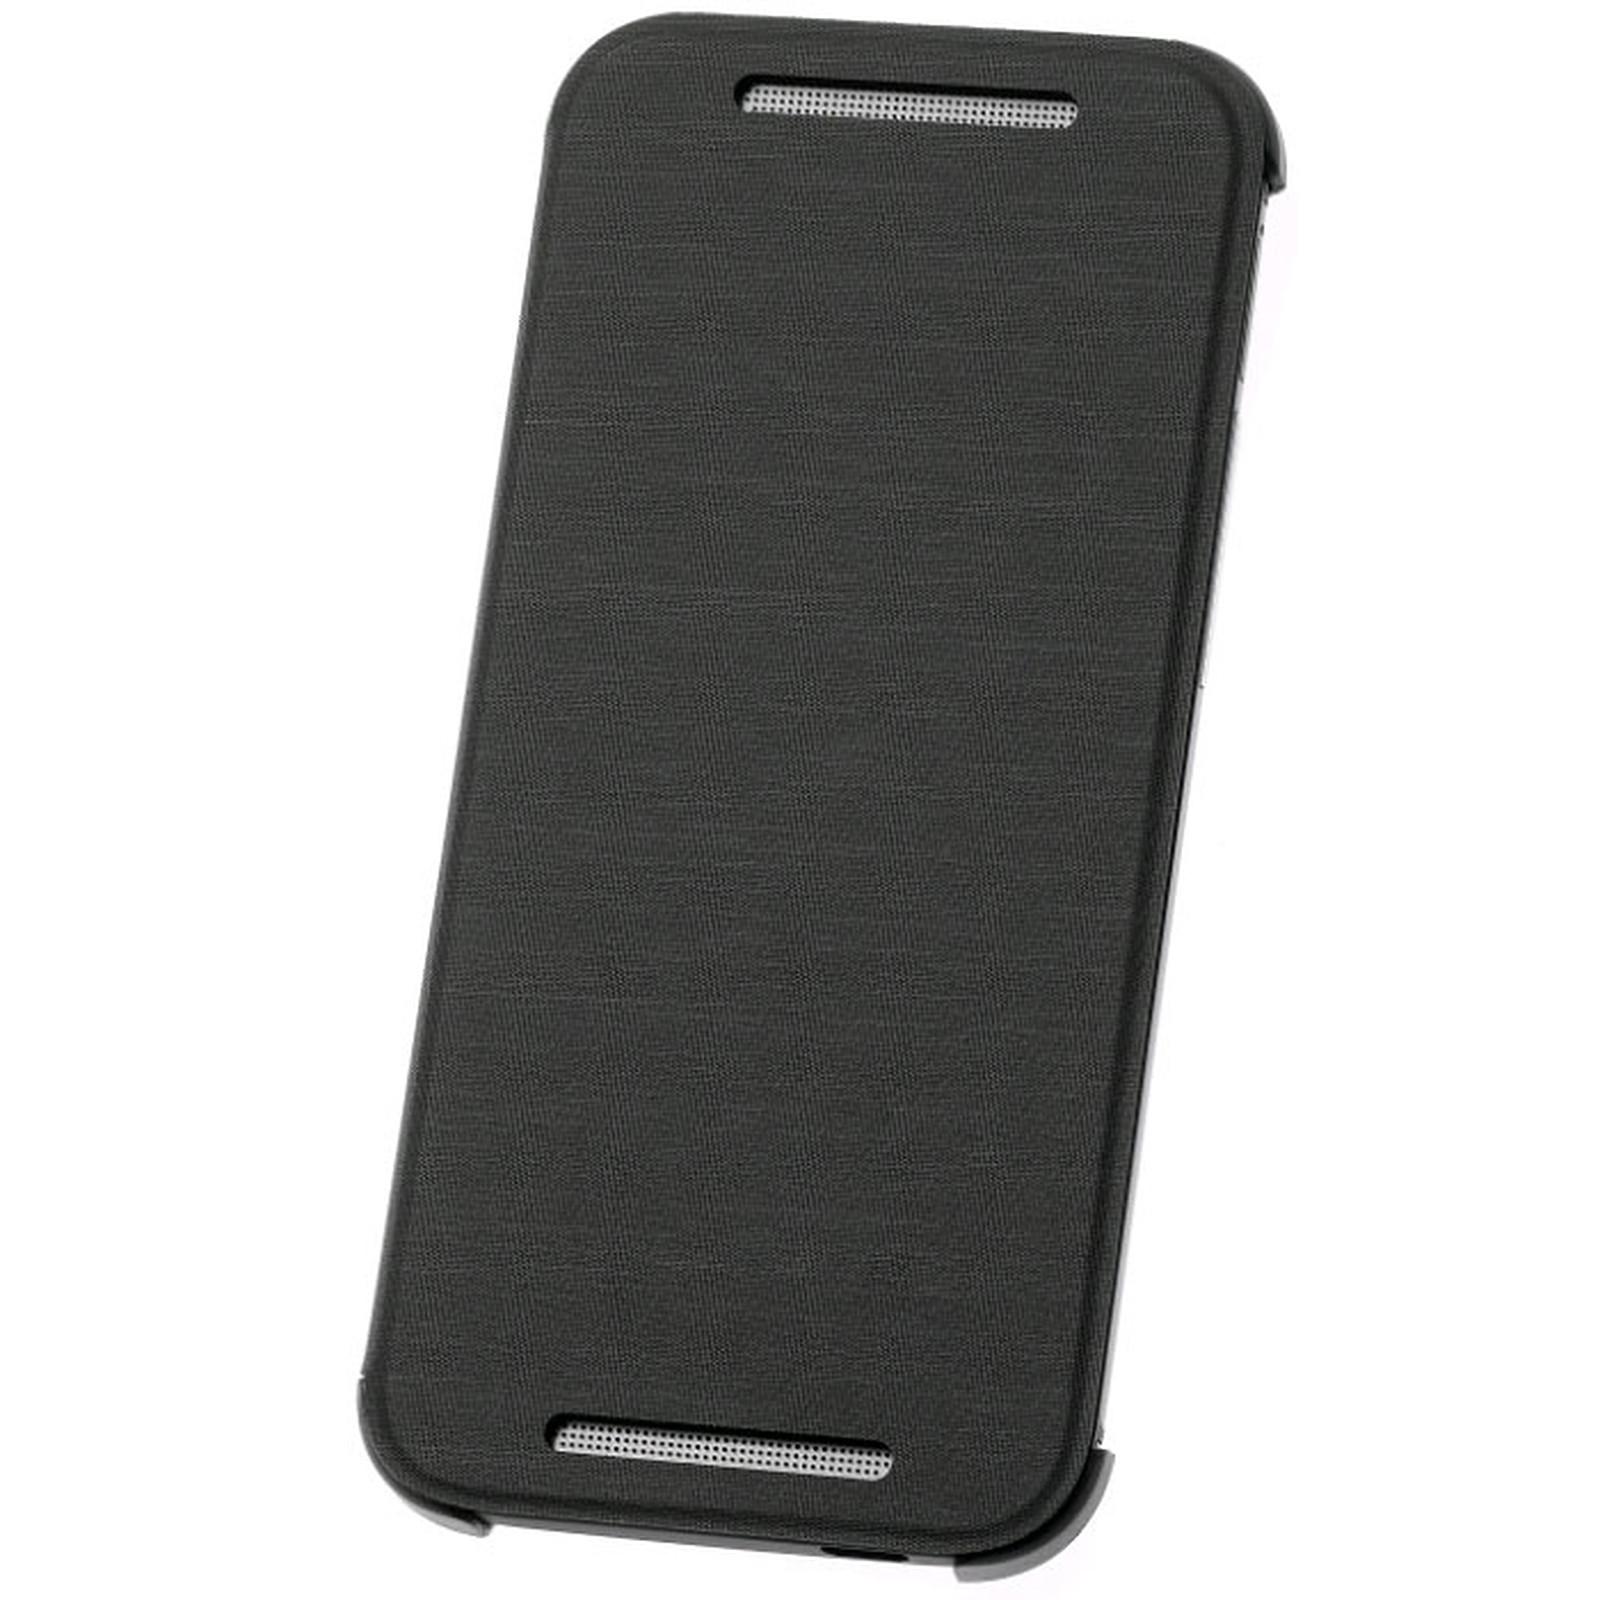 HTC Etui Folio Flipcase Gris HTC One mini 2